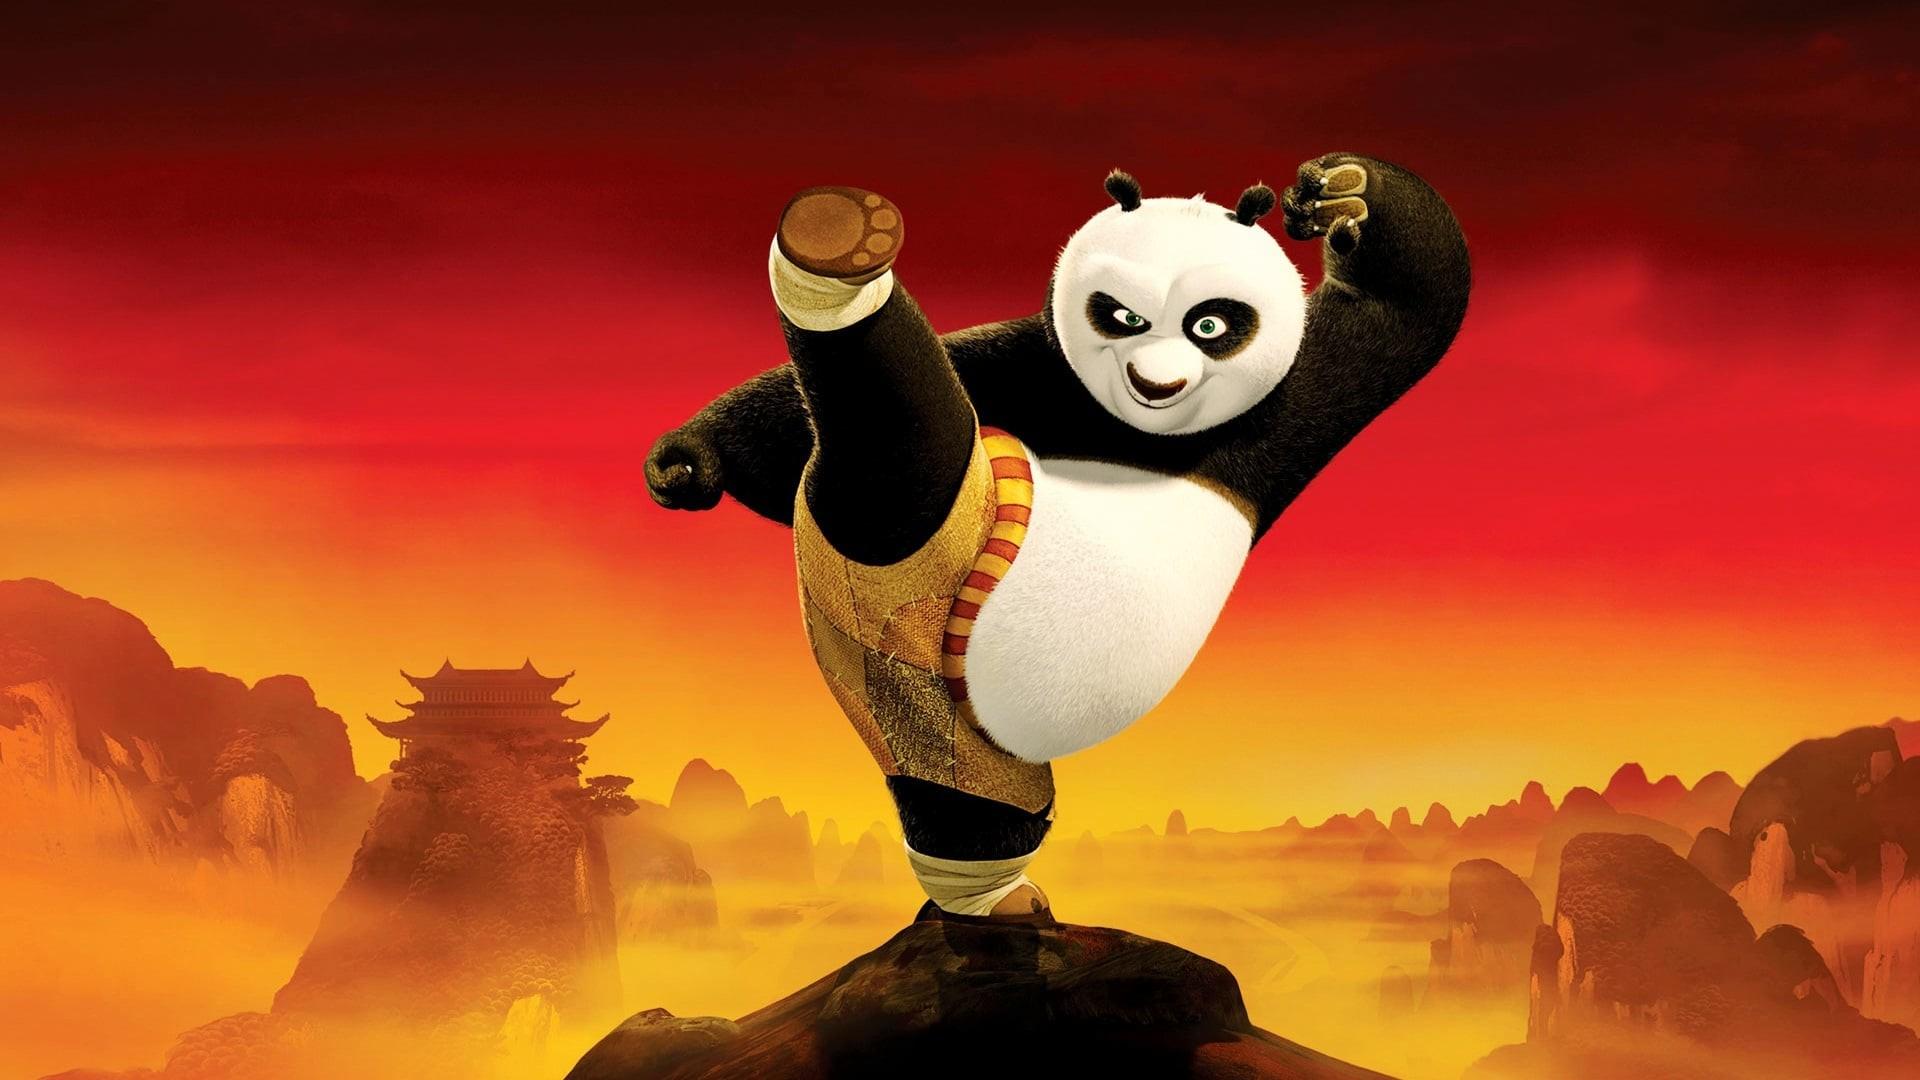 Kung Fu Panda Wallpapers HD Wallpapers 1920×1080 Kung Fu Panda 3 Wallpapers  (39